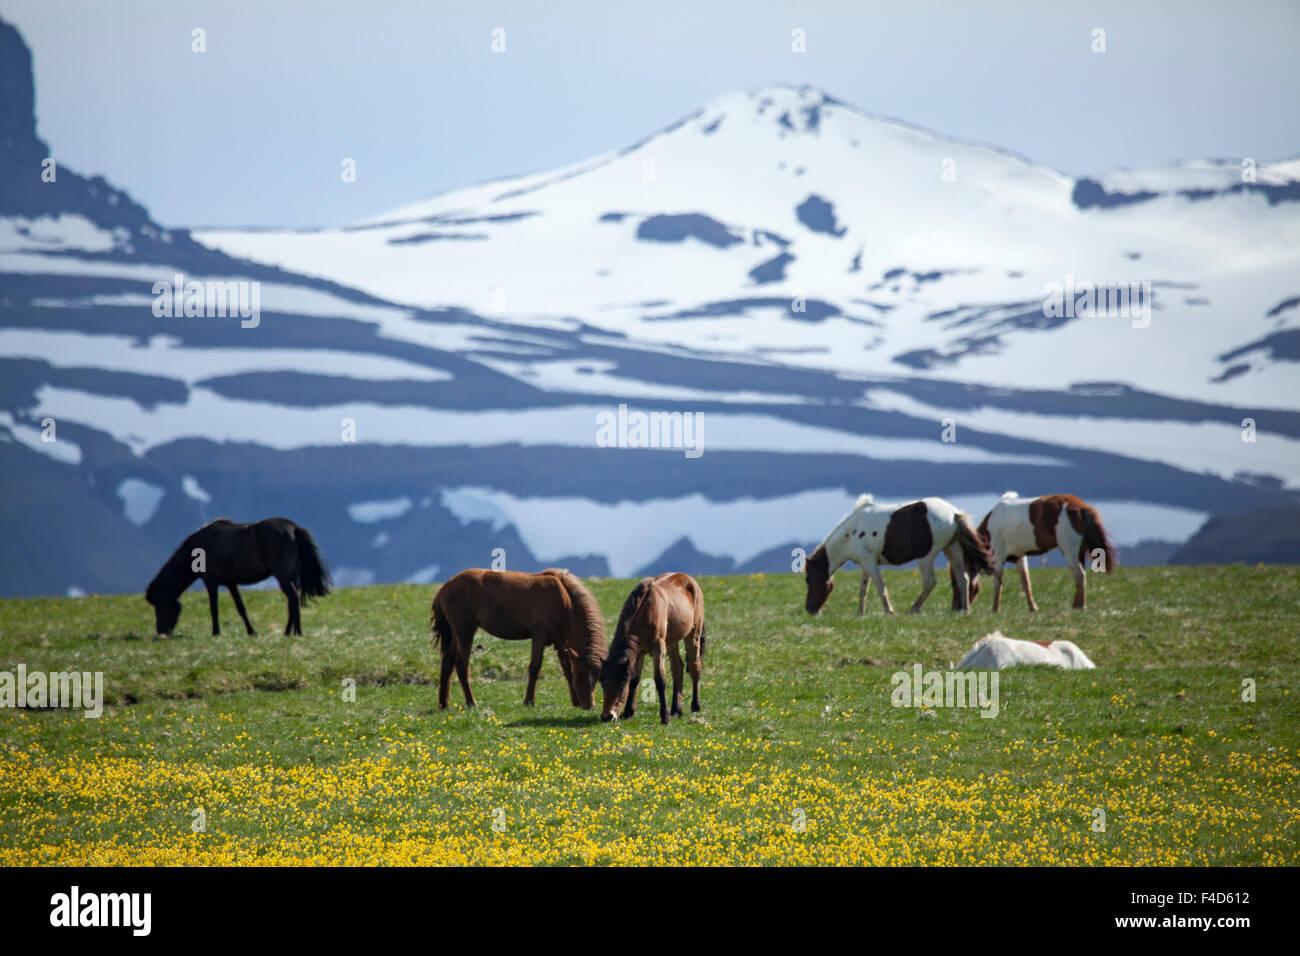 Icelandic horses grazing beneath snowy mountains, Nordhurland Vestra, Iceland. - Stock Image